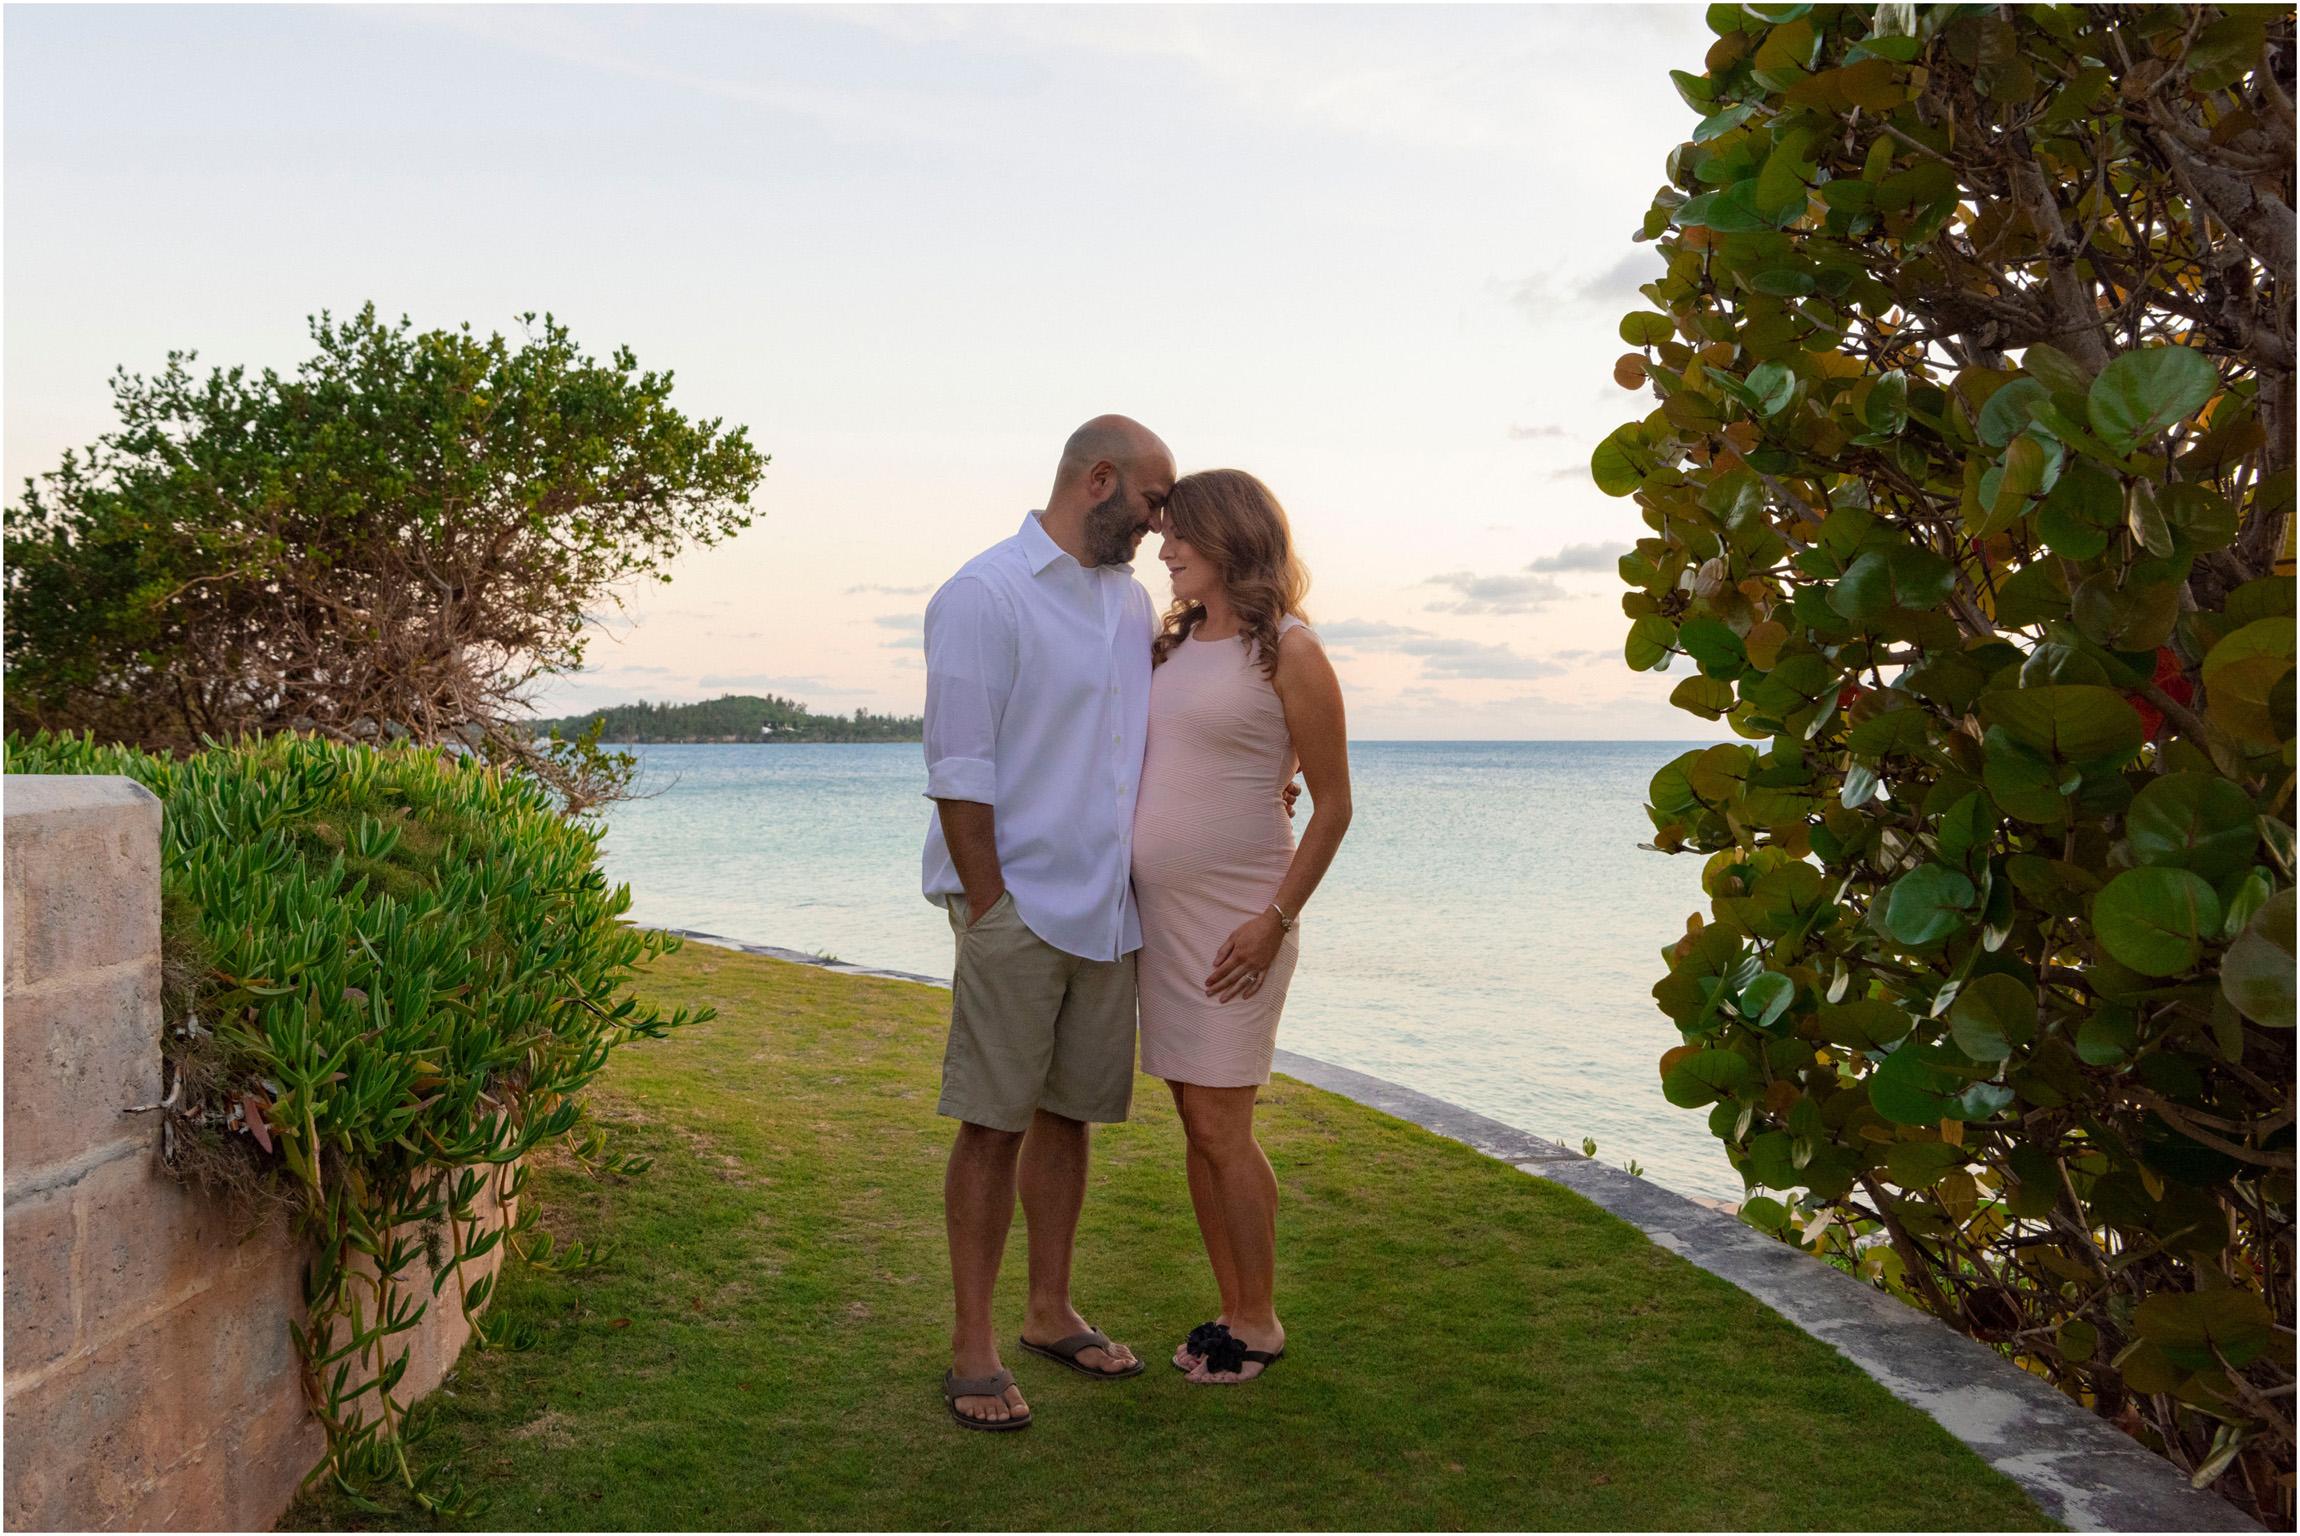 ©FianderFoto_Bermuda Maternity Photographer_Elys Harbour_Ft Scaur_Airbnb_Victoria_Mike_027.jpg